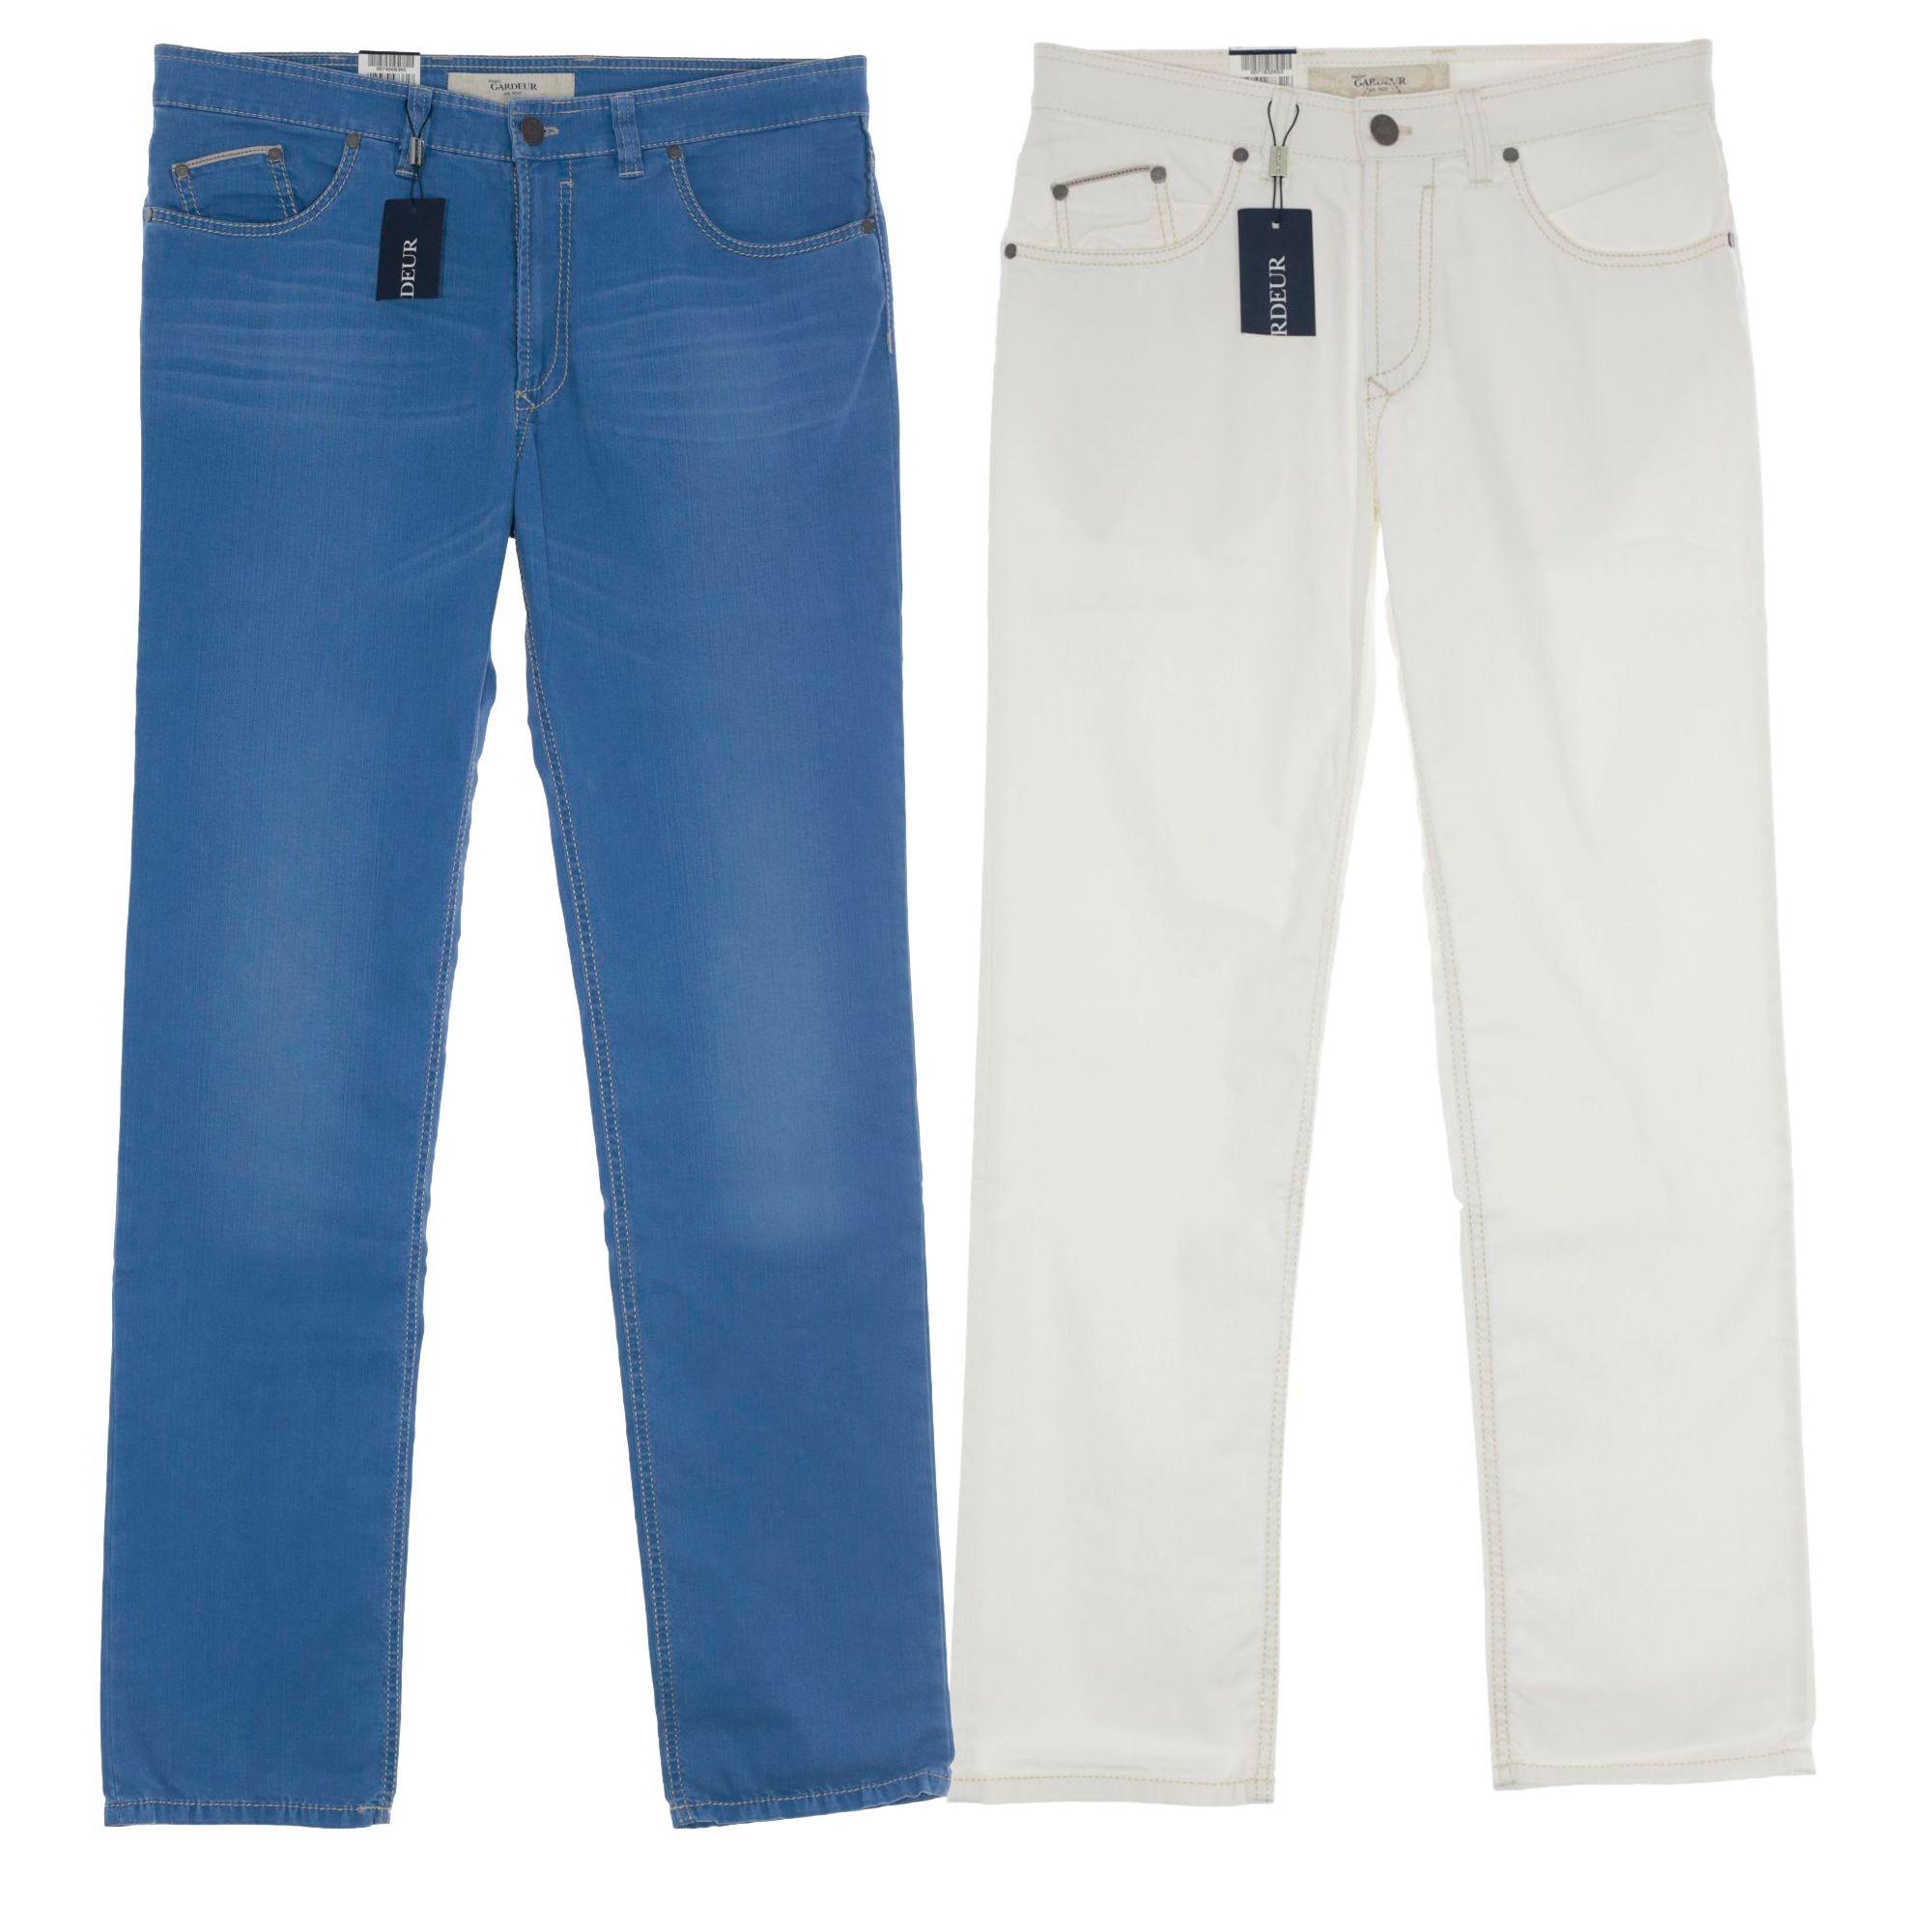 gardeur jeans bill herren stretch modern fit ebay. Black Bedroom Furniture Sets. Home Design Ideas